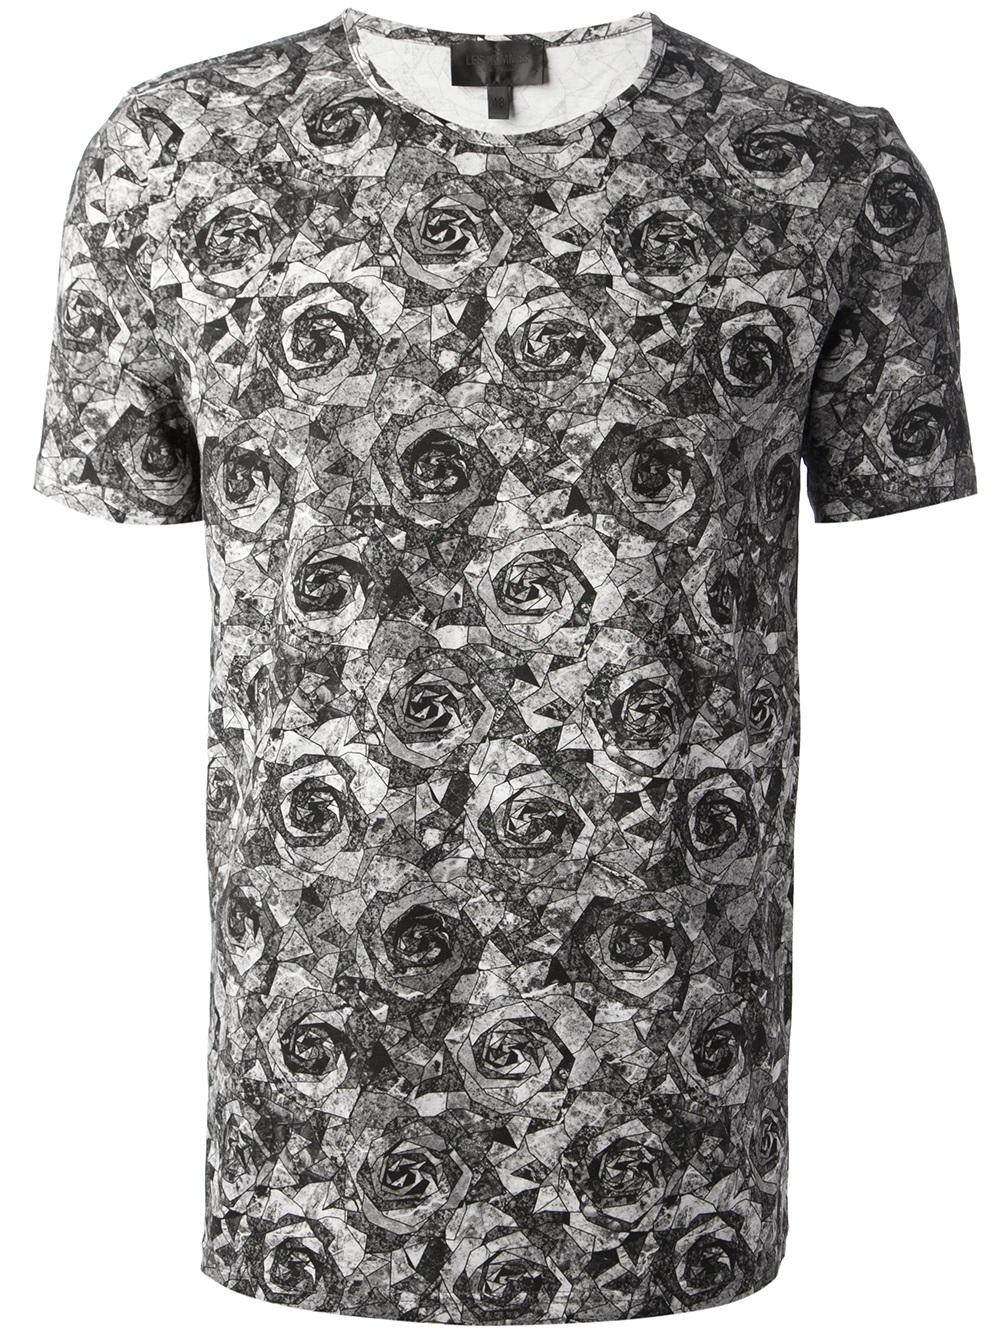 T shirt printing at white rose - Gallery